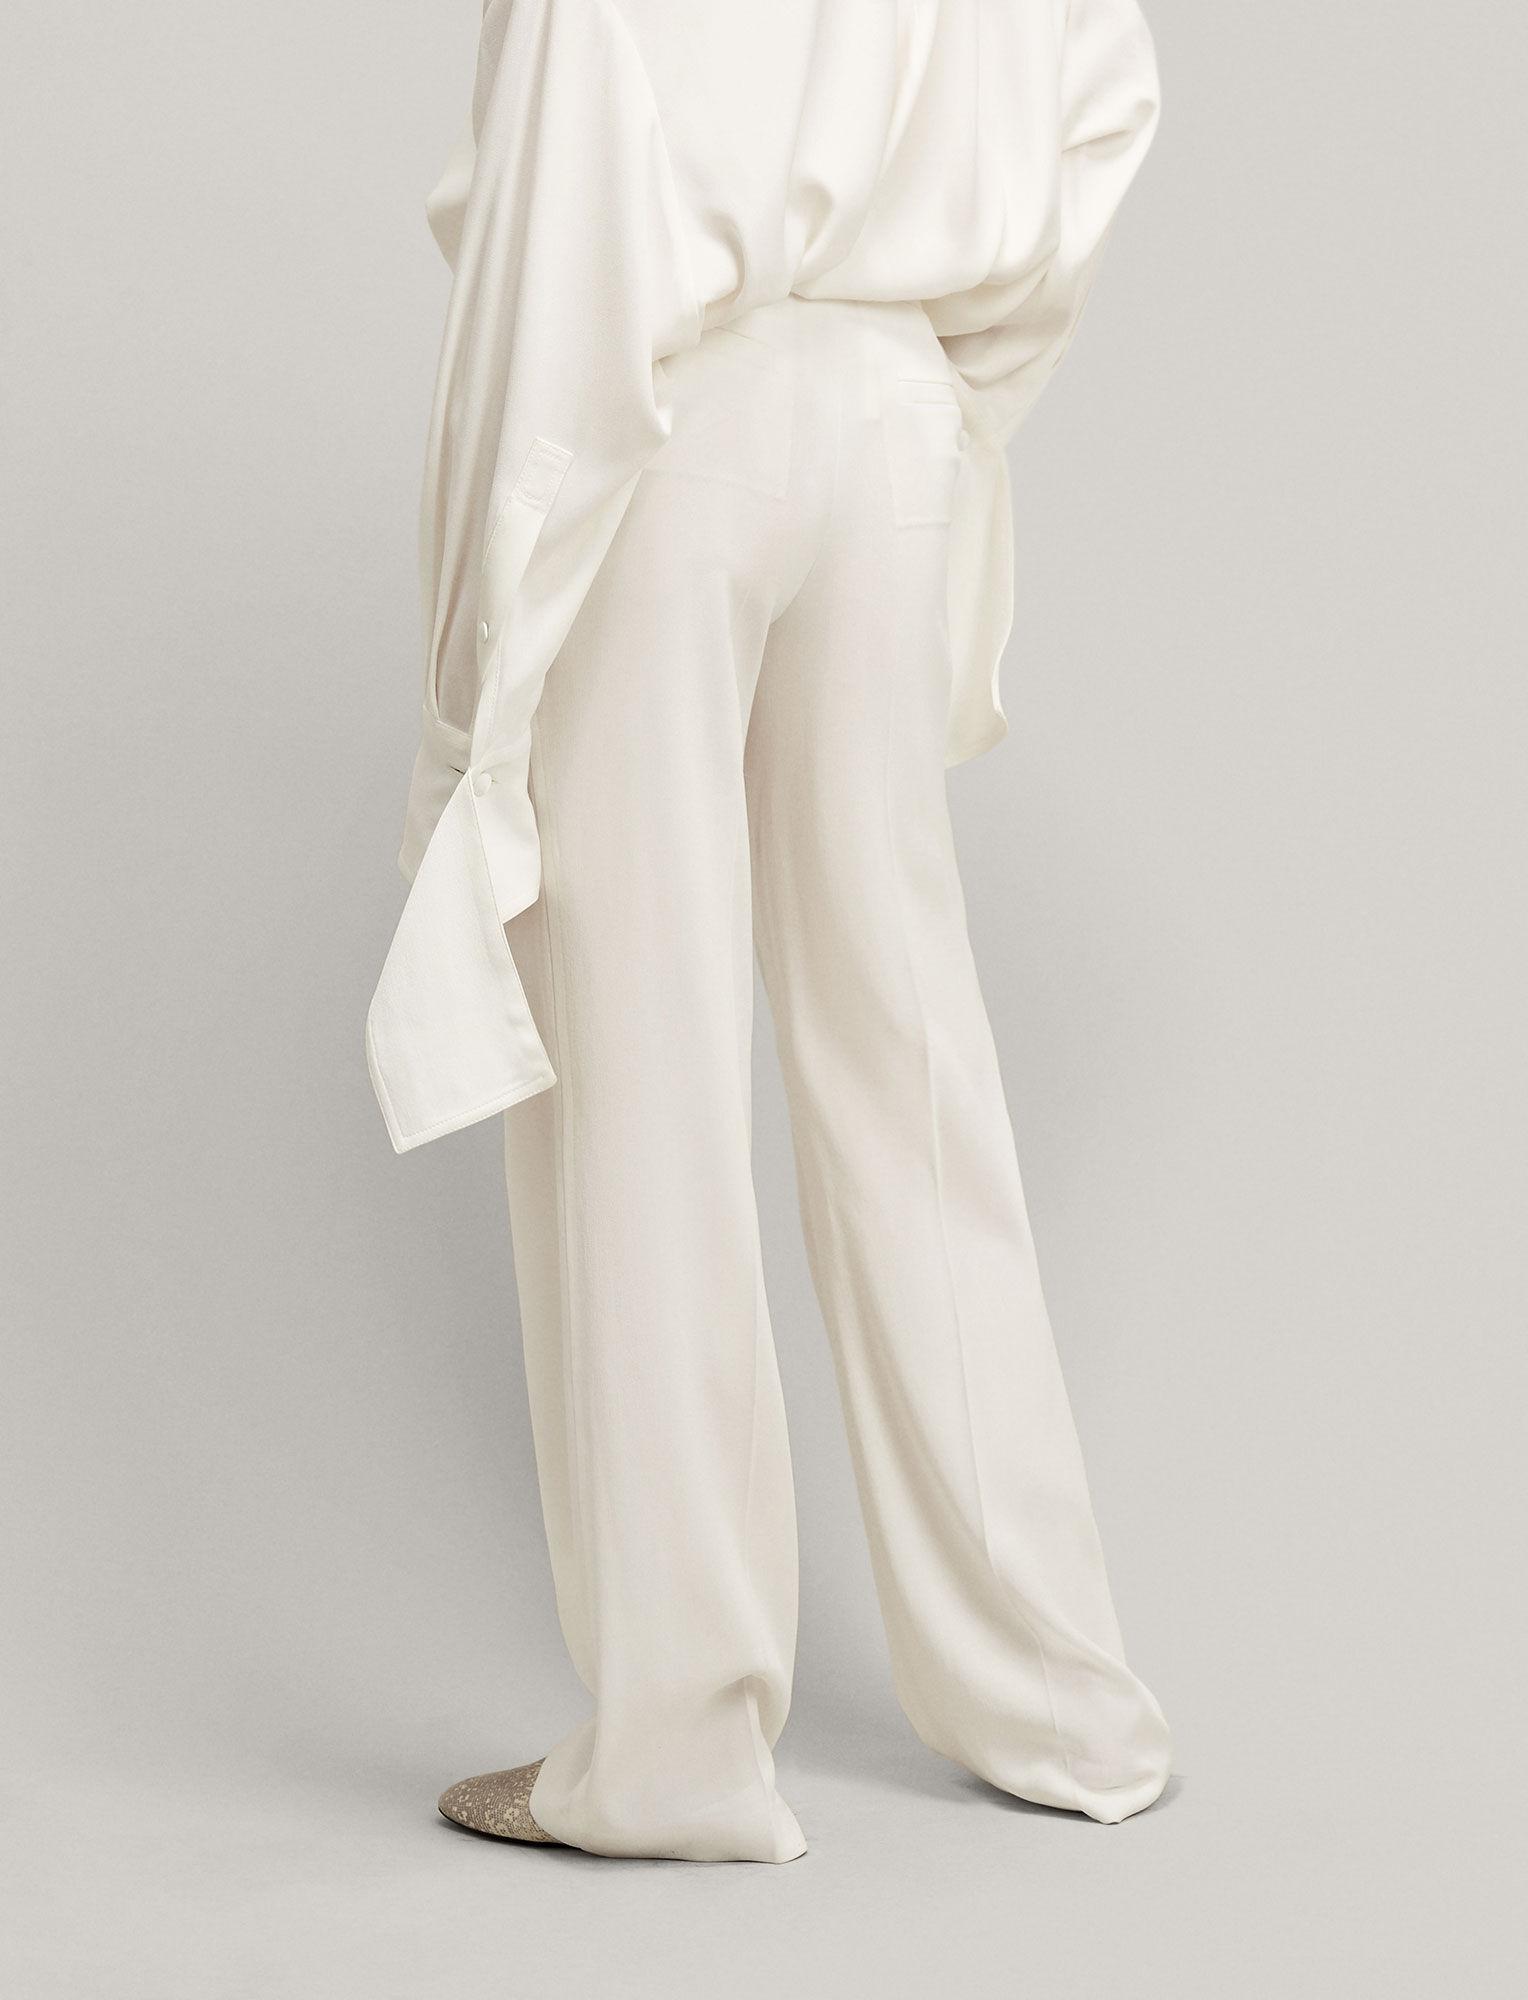 Joseph, New Ferdy Crepe Satin Trousers, in WHITE